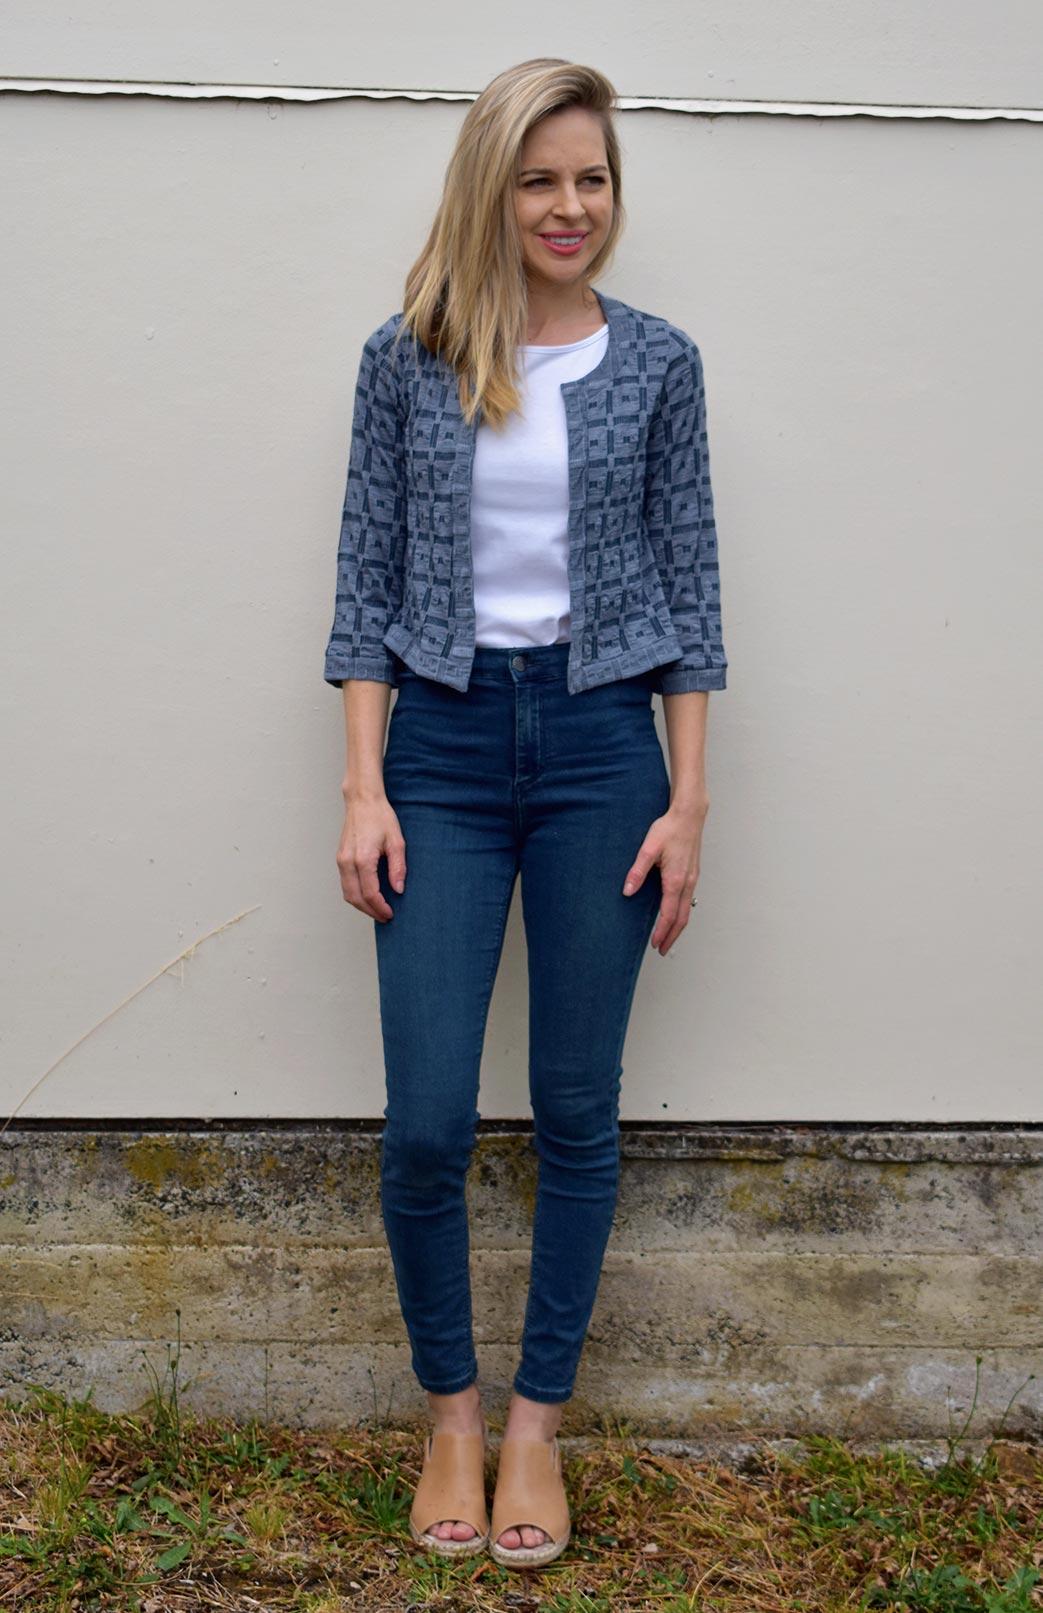 Coco Jacket - Women's Steel Blue Check Patterned 100% Merino Wool Coco Jacket - Smitten Merino Tasmania Australia